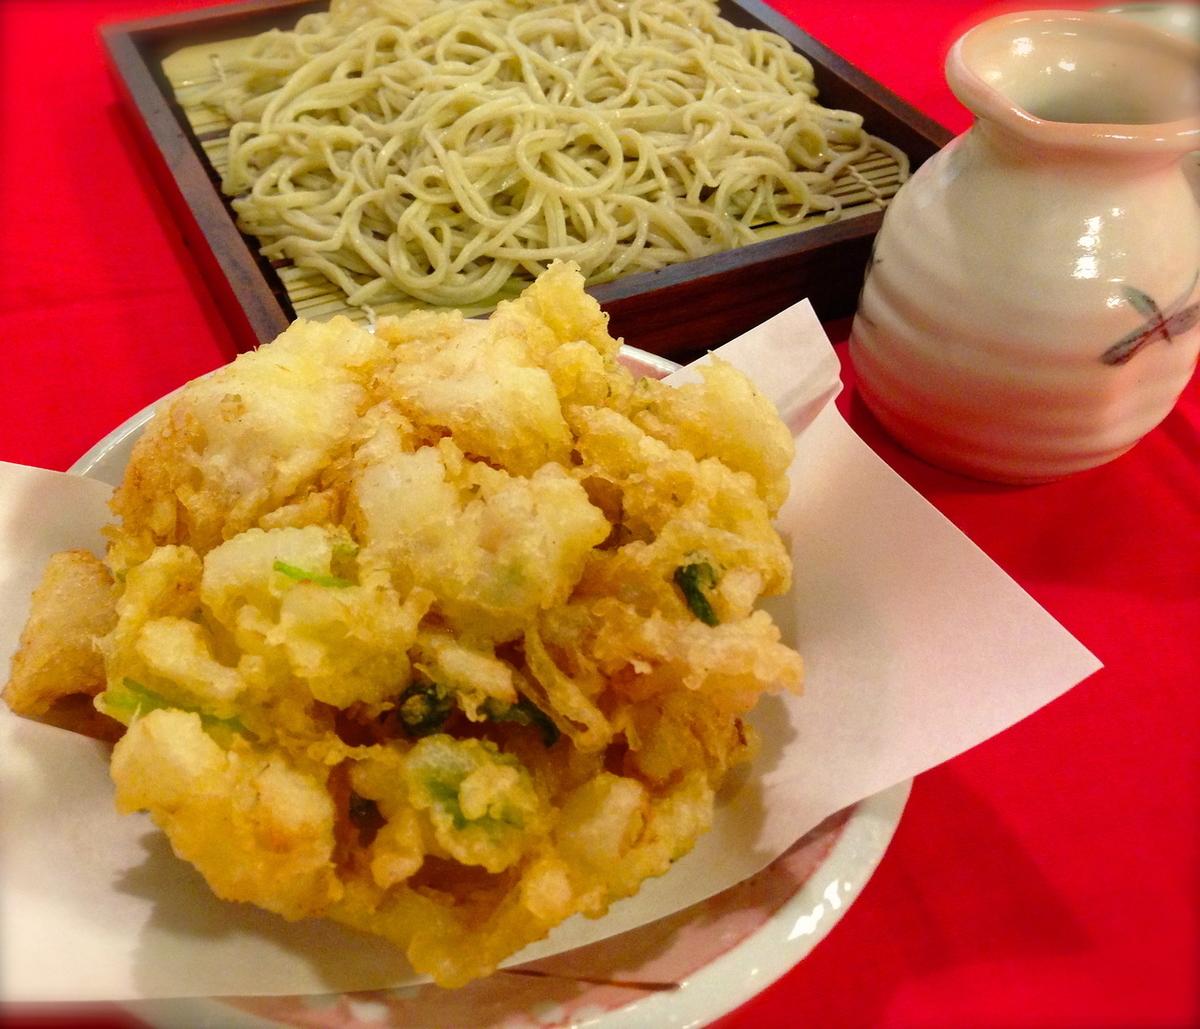 Kaki炸豆腐